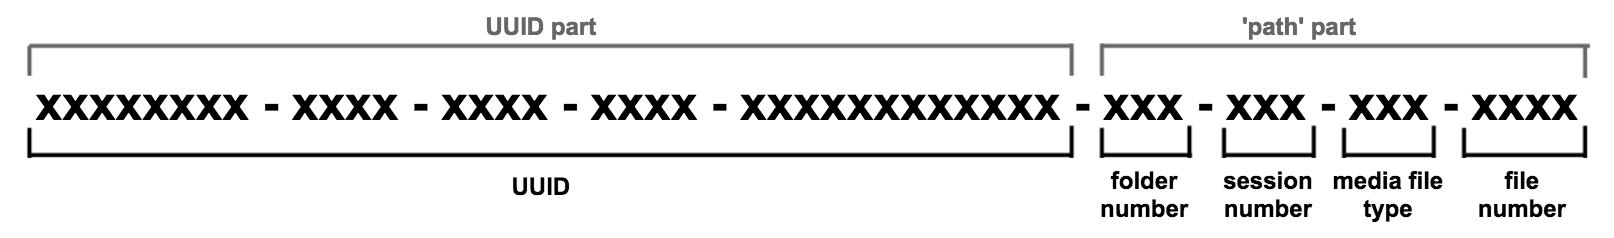 UUID format